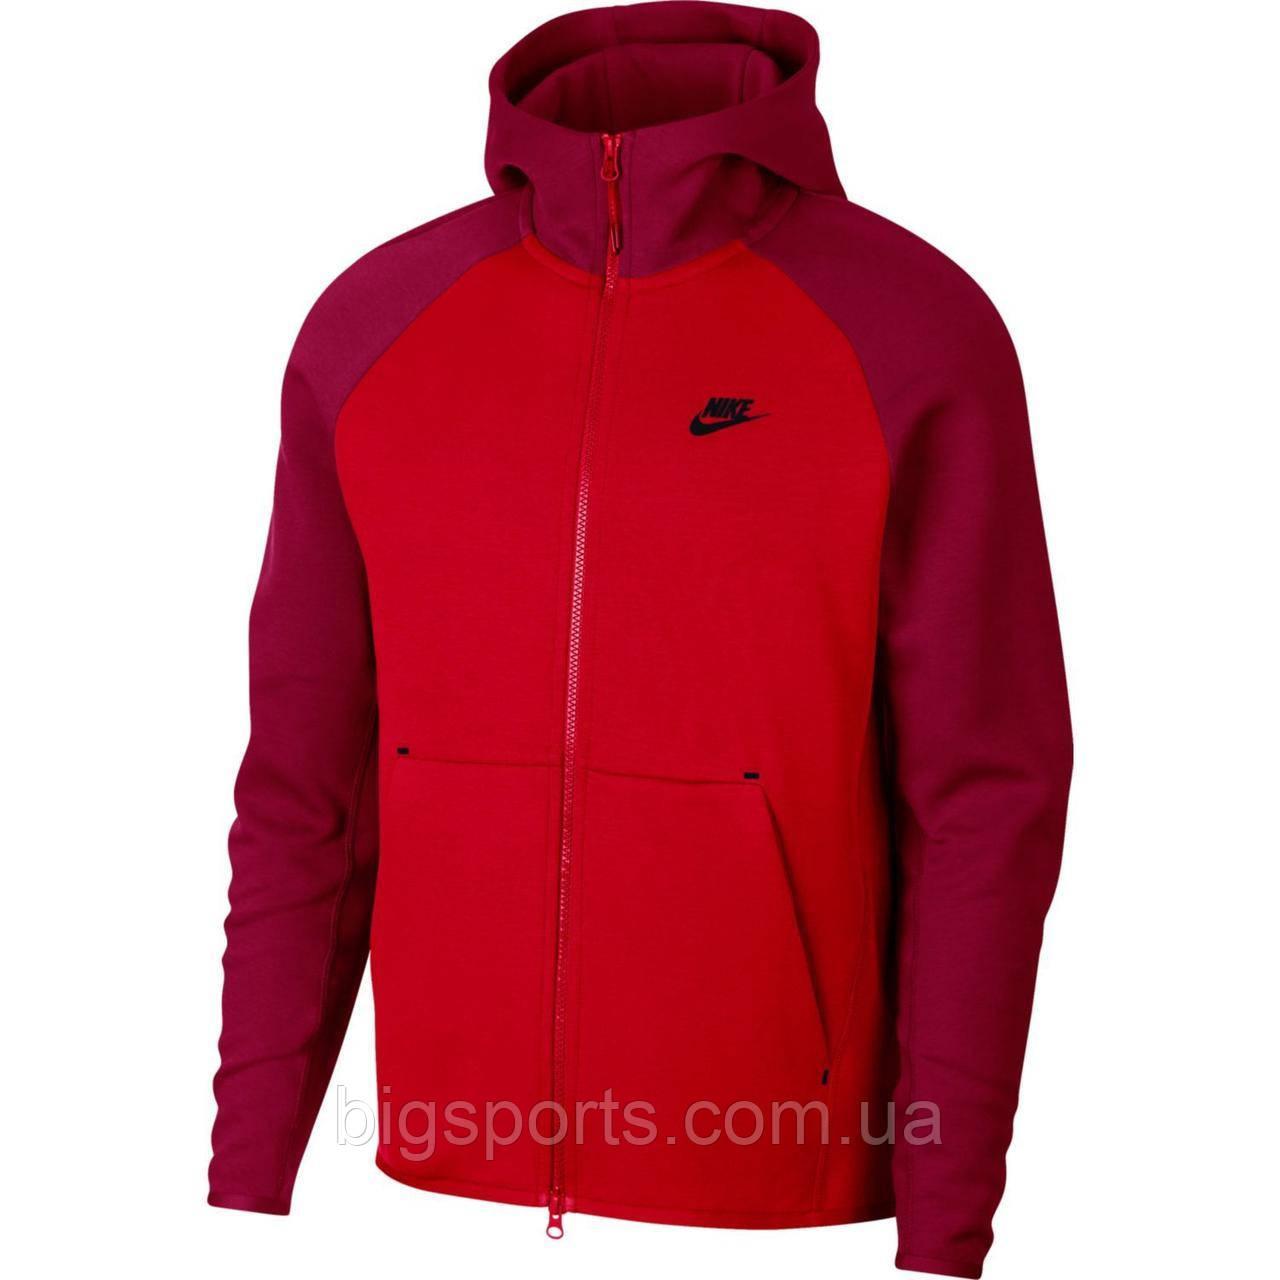 3ba1989f Кофта муж. Nike M Nsw Tch Flc Hoodie Fz (арт. 928483-657): продажа ...